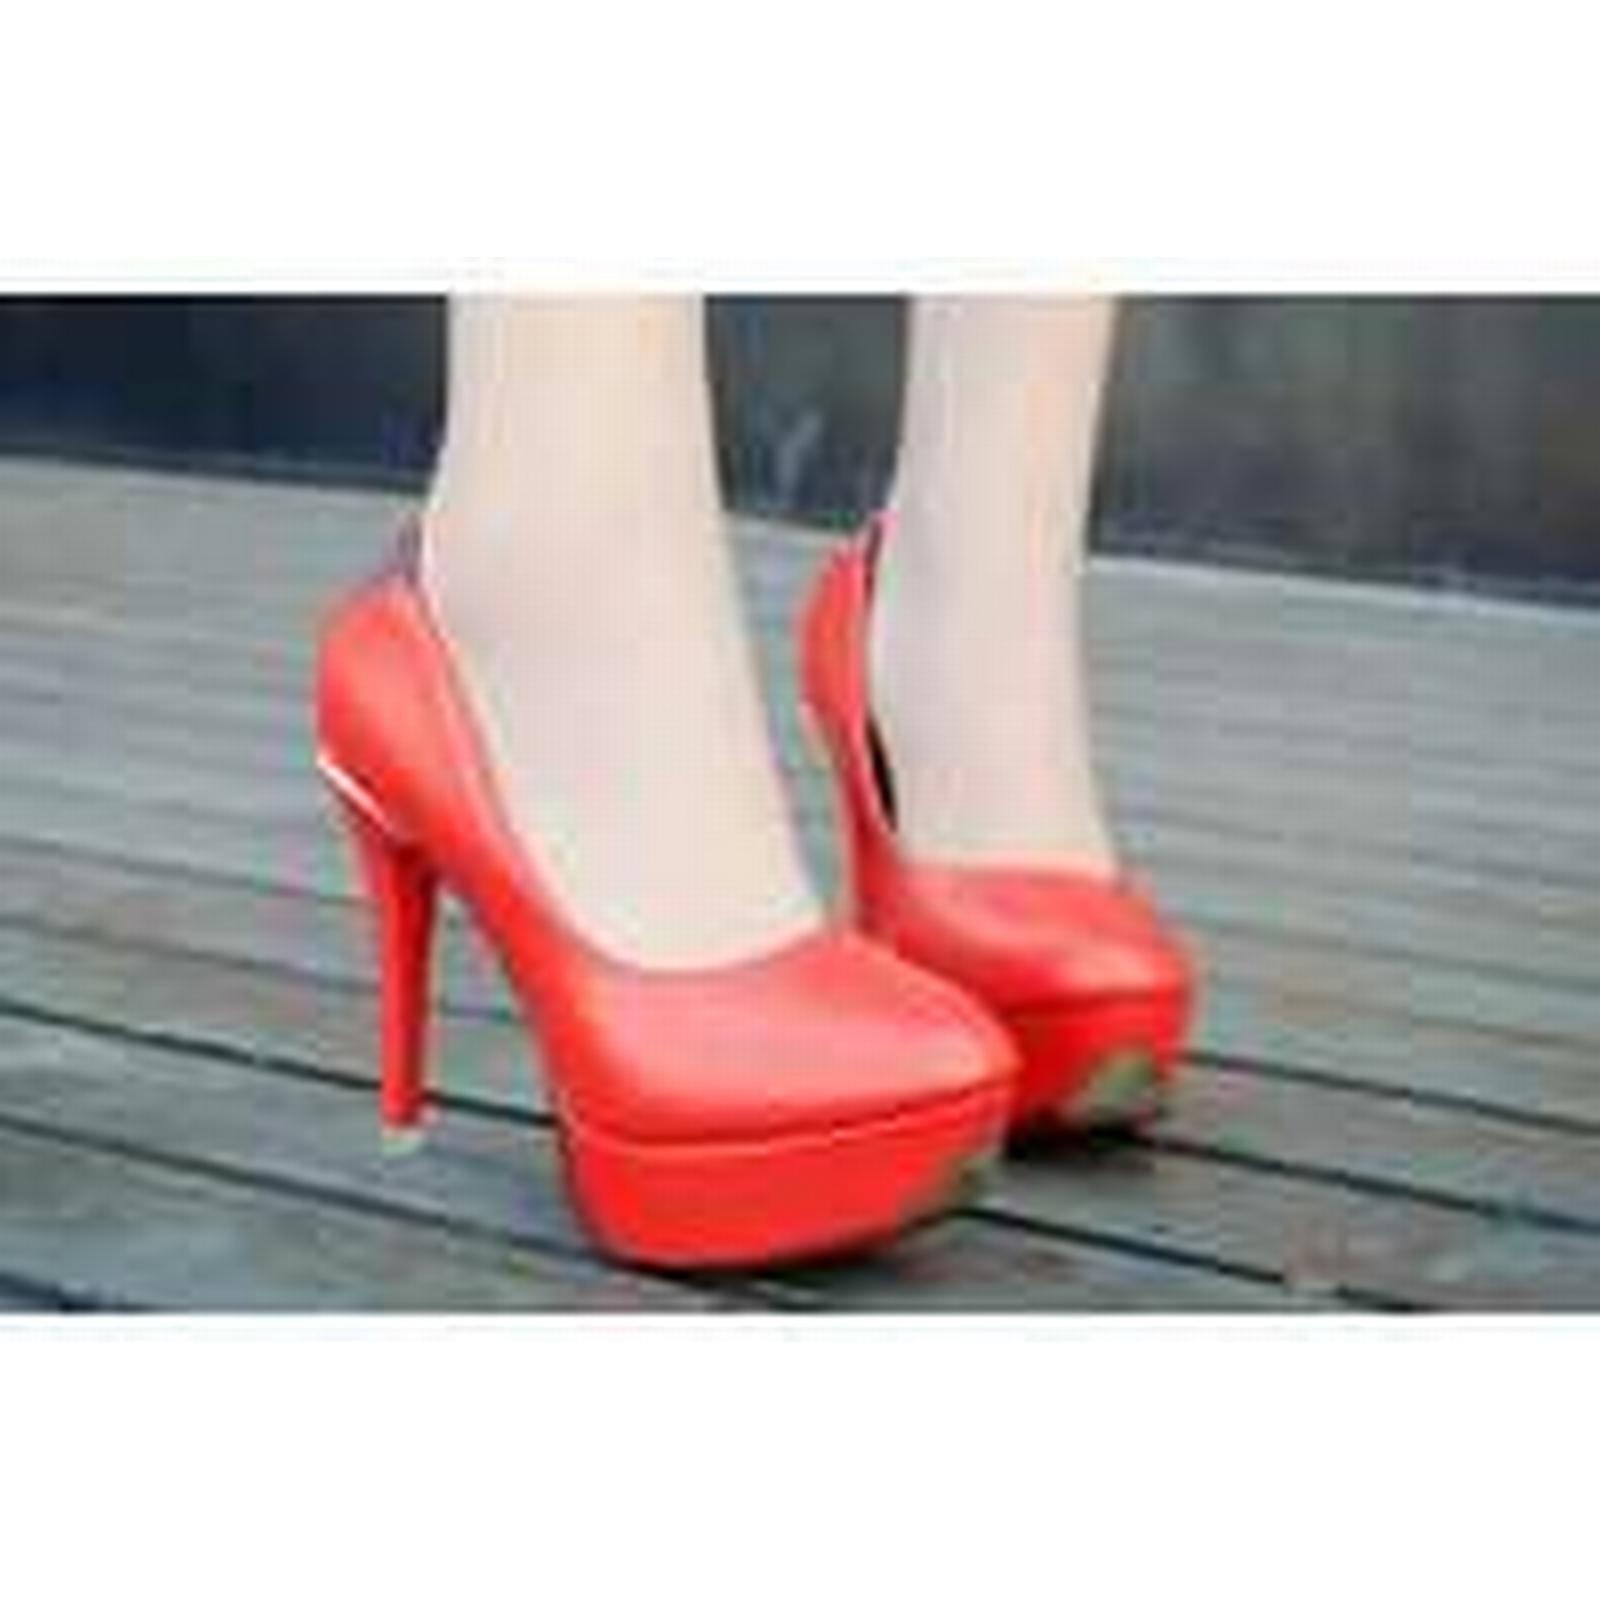 Bonanza (Global) pp309 Shimmering rhinestones 4-9.5 high-heeled pump US Size 4-9.5 rhinestones red da3a28